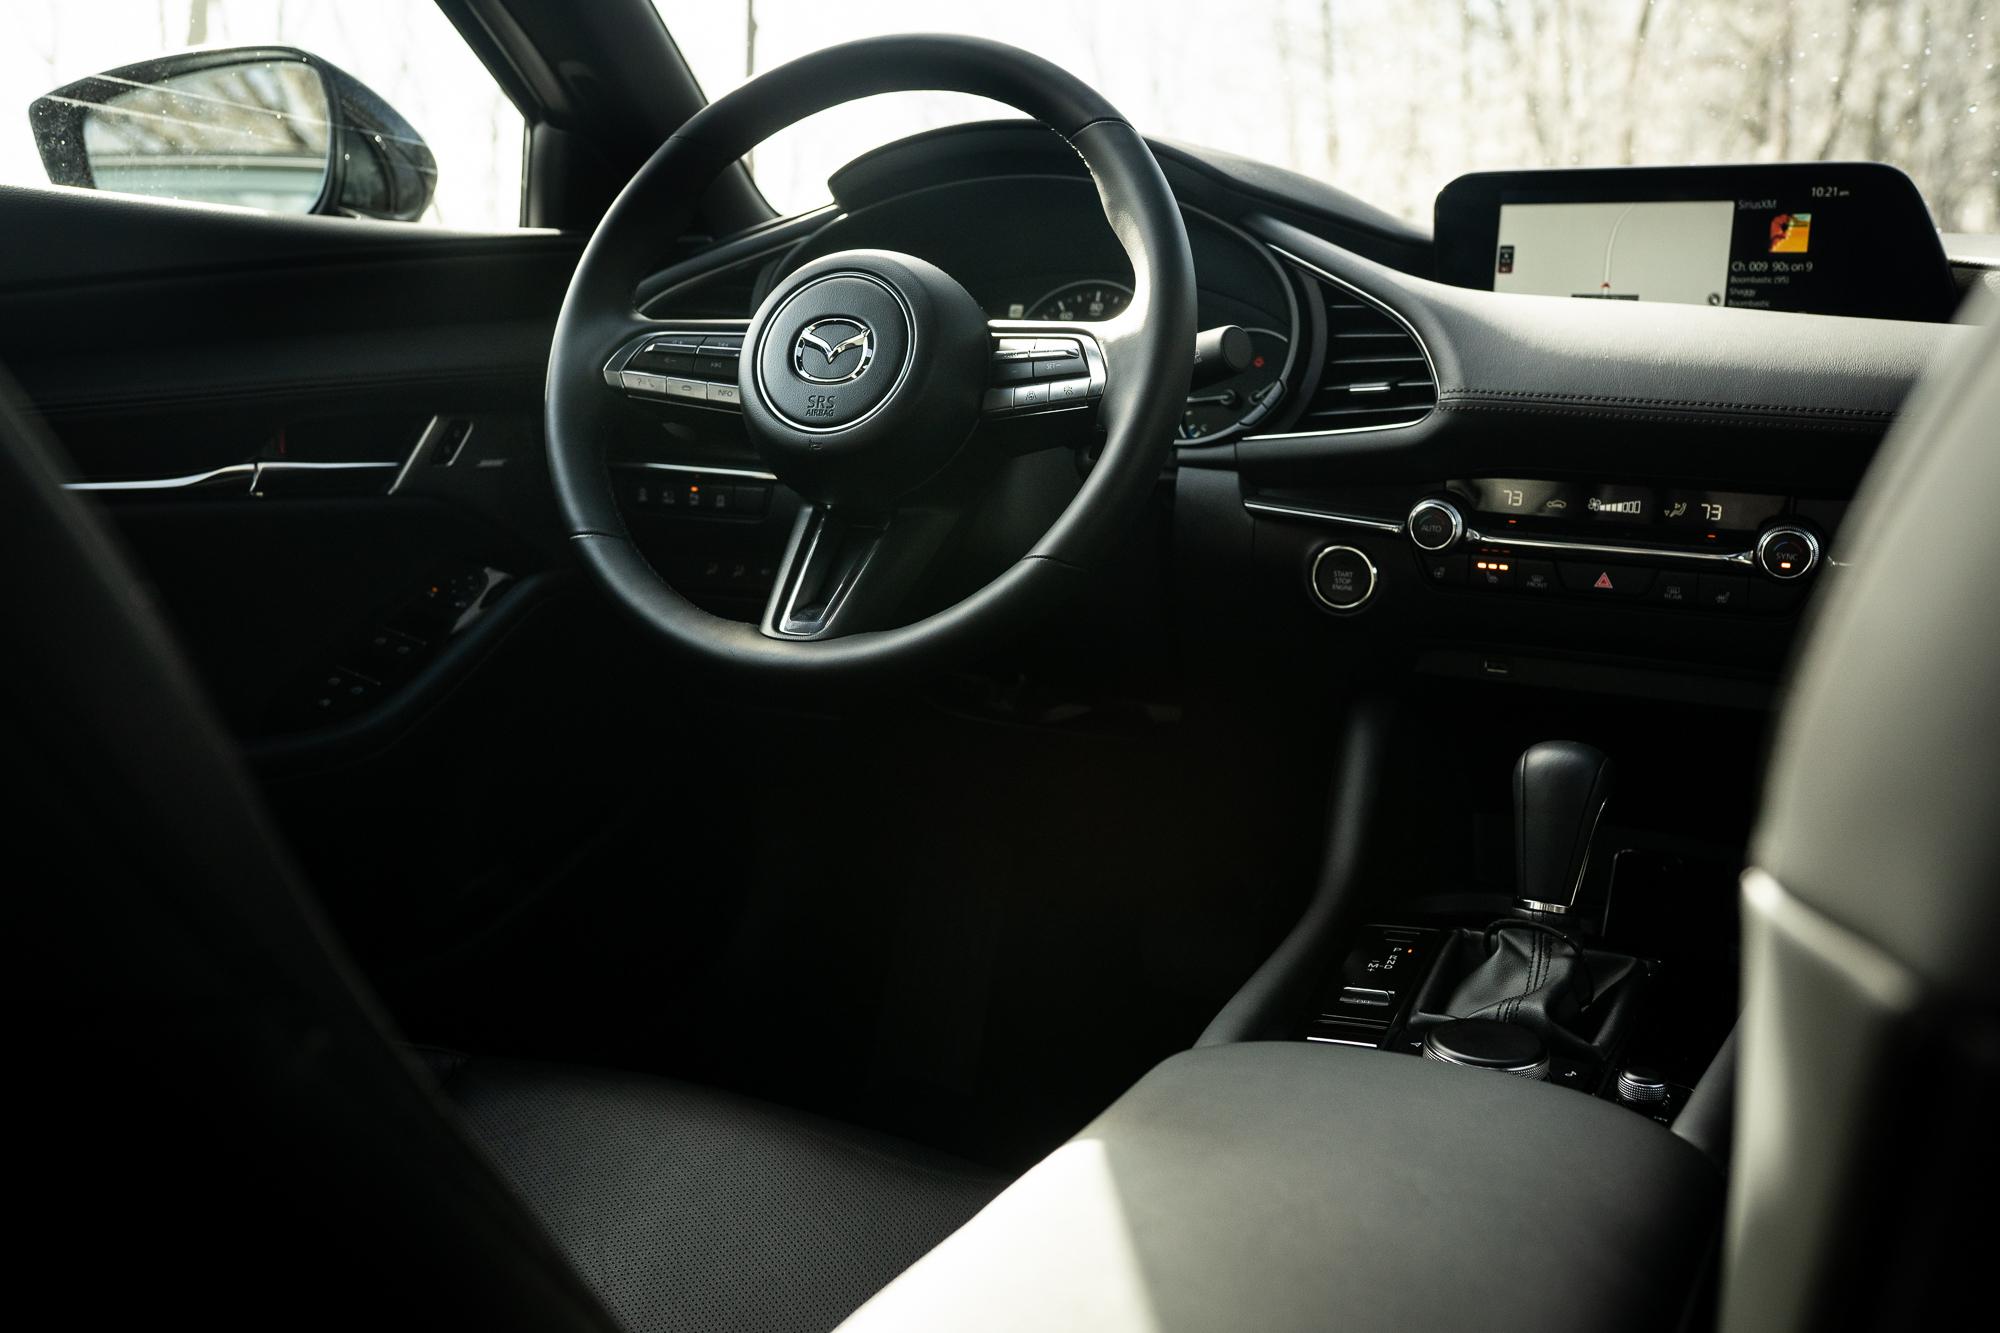 2021 Mazda 3 2.5T AWD interior front steering wheel